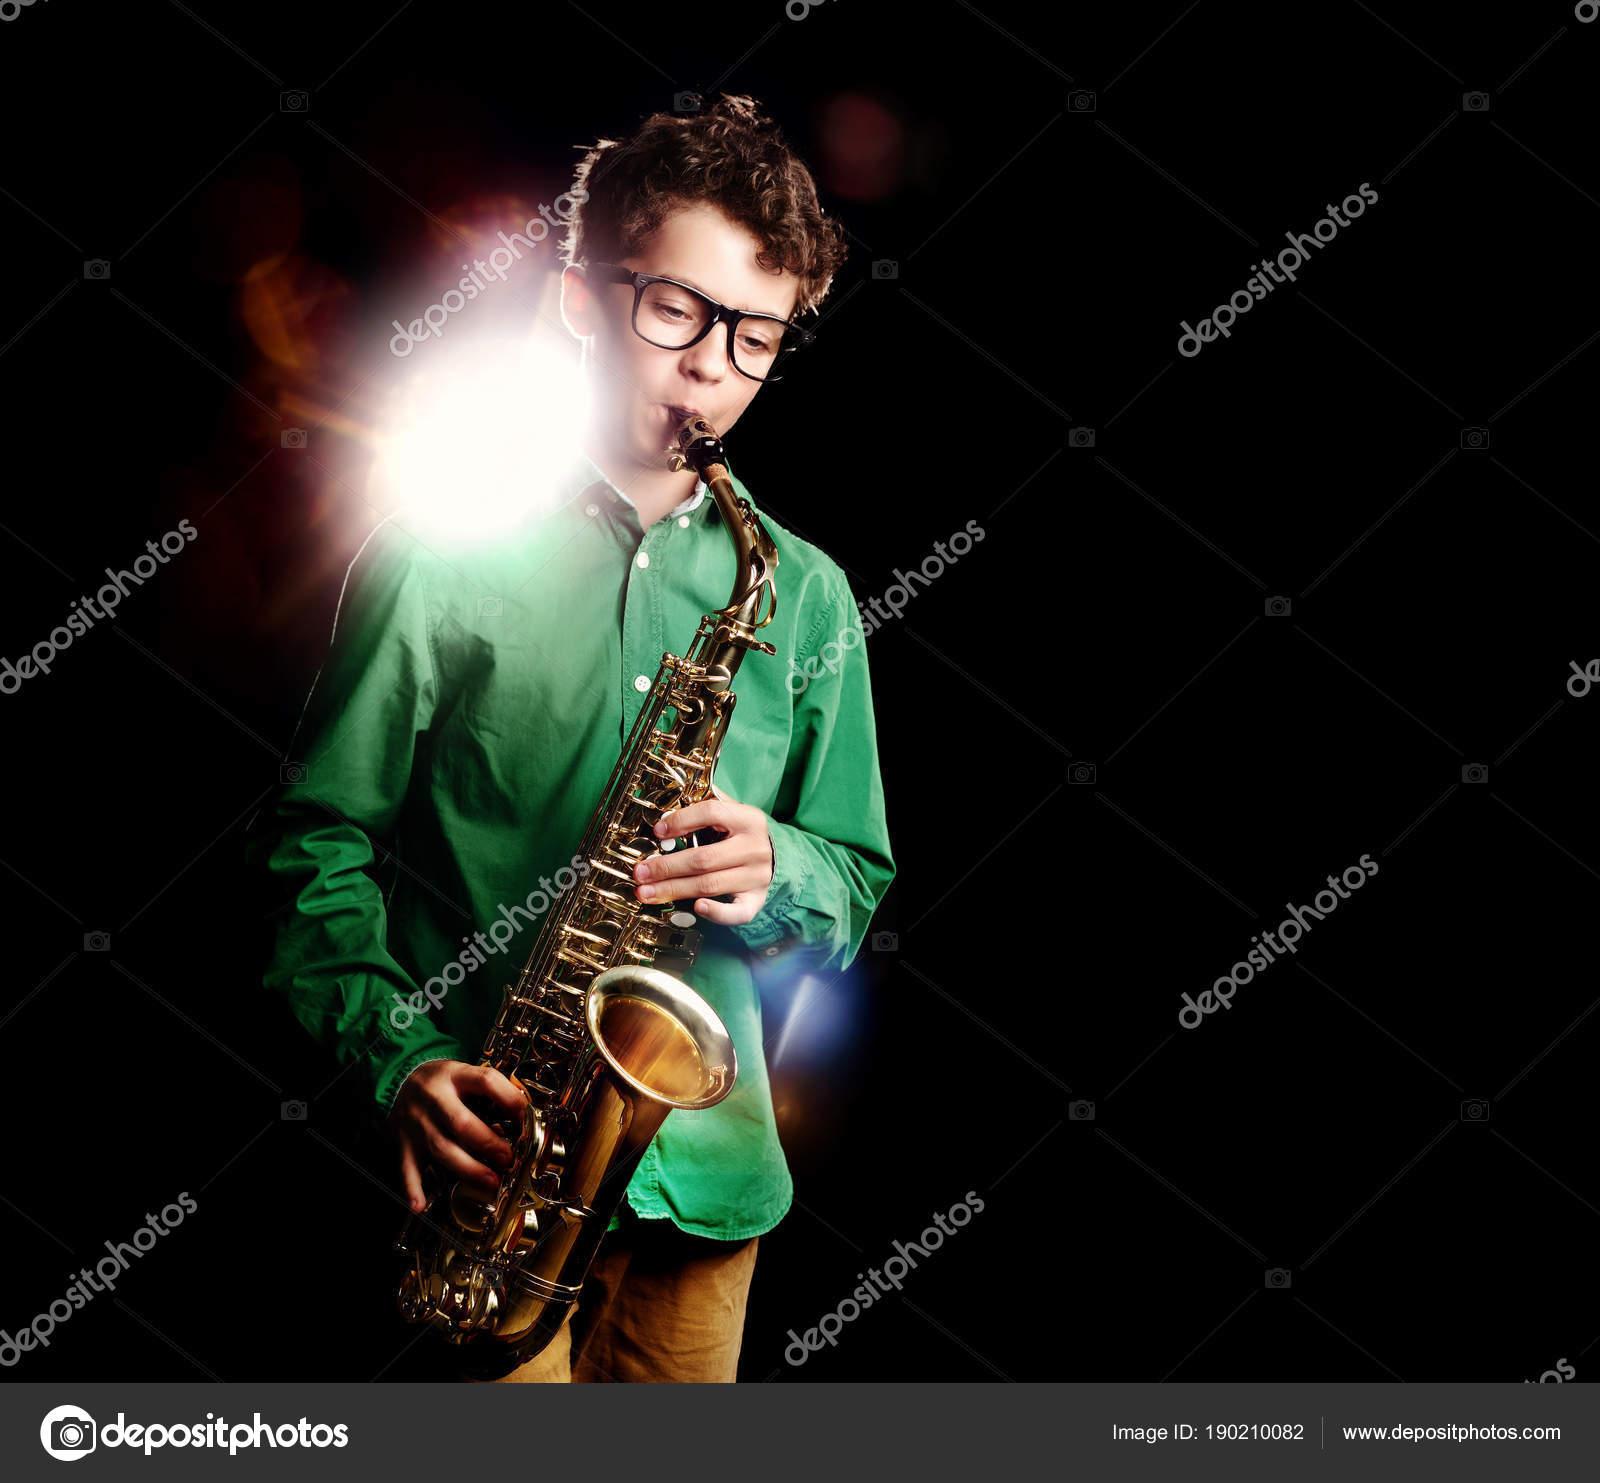 d8a61886a5c6 Εφηβικό αγόρι που παίζει σαξόφωνο σε μαύρο φόντο — Φωτογραφία ...